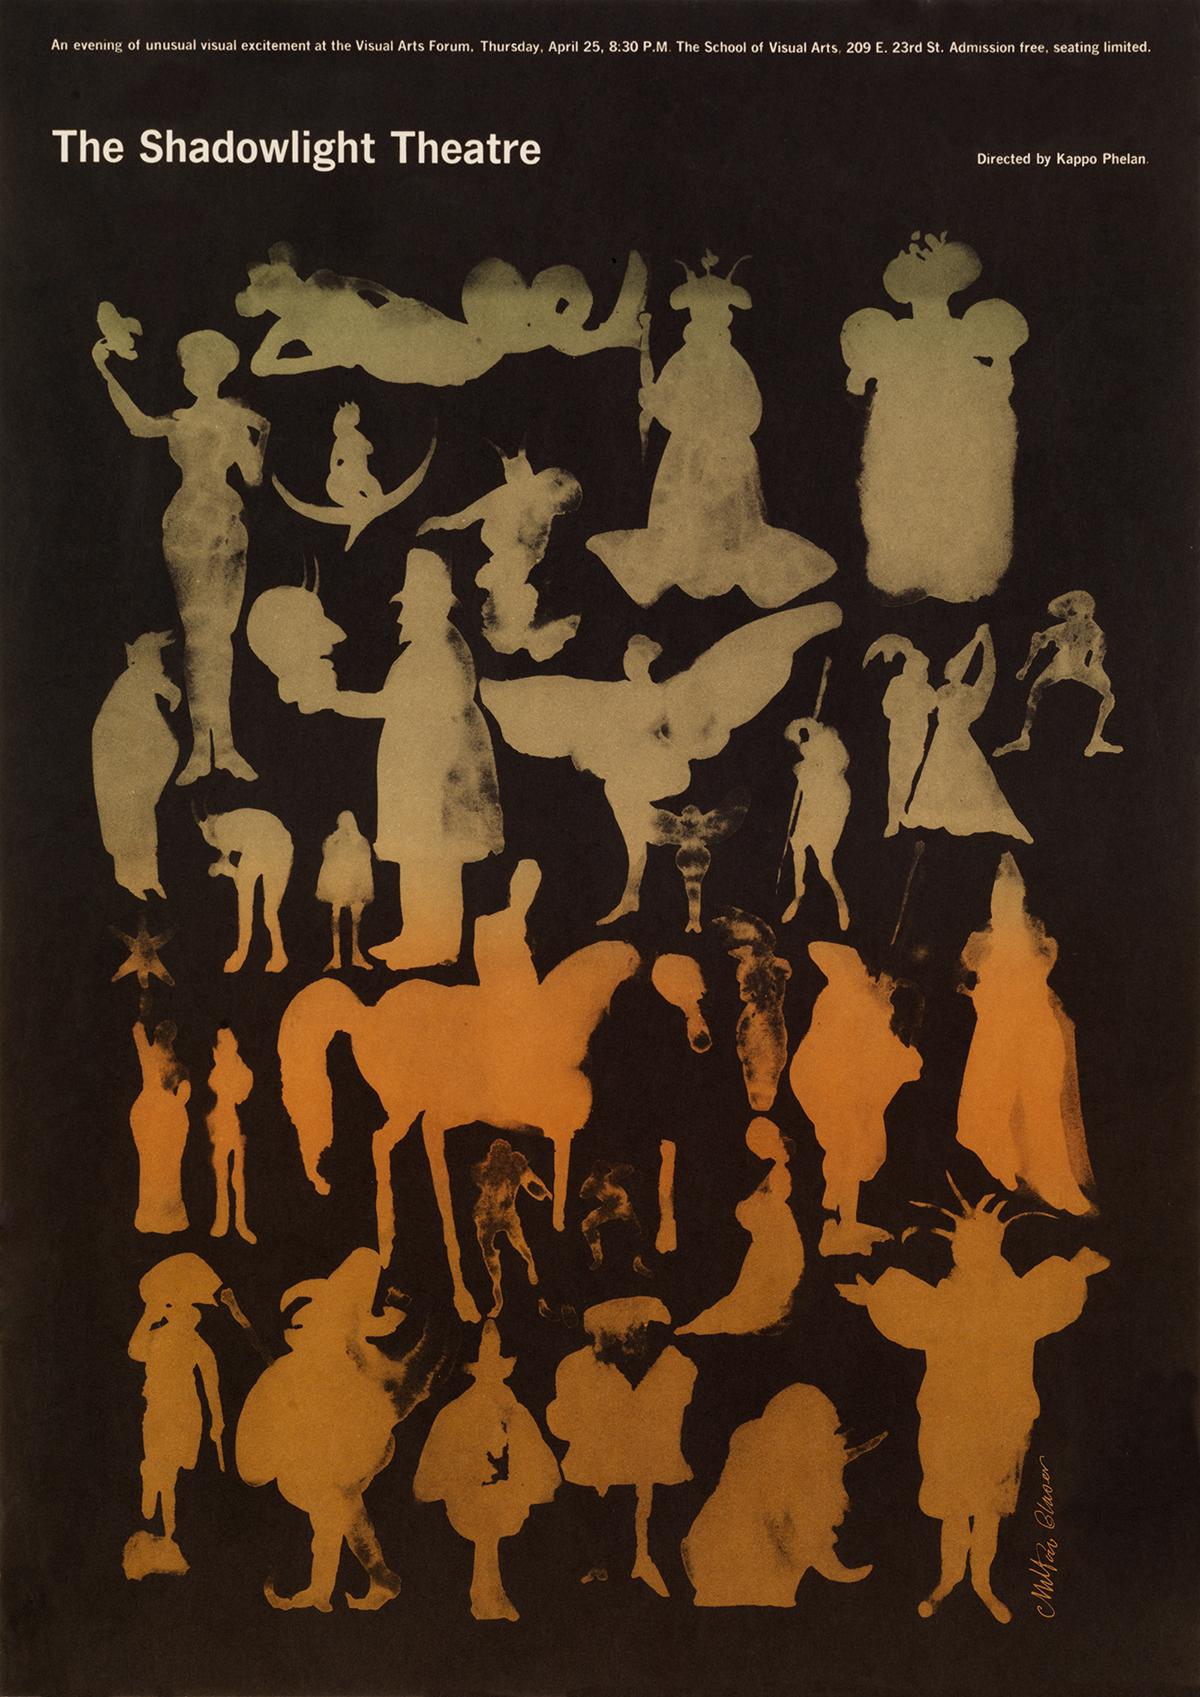 Thumbnail for The Glaser Nobody Knows: 2 Milton Posters For Kappo Phelan's Shadowlight Theatre